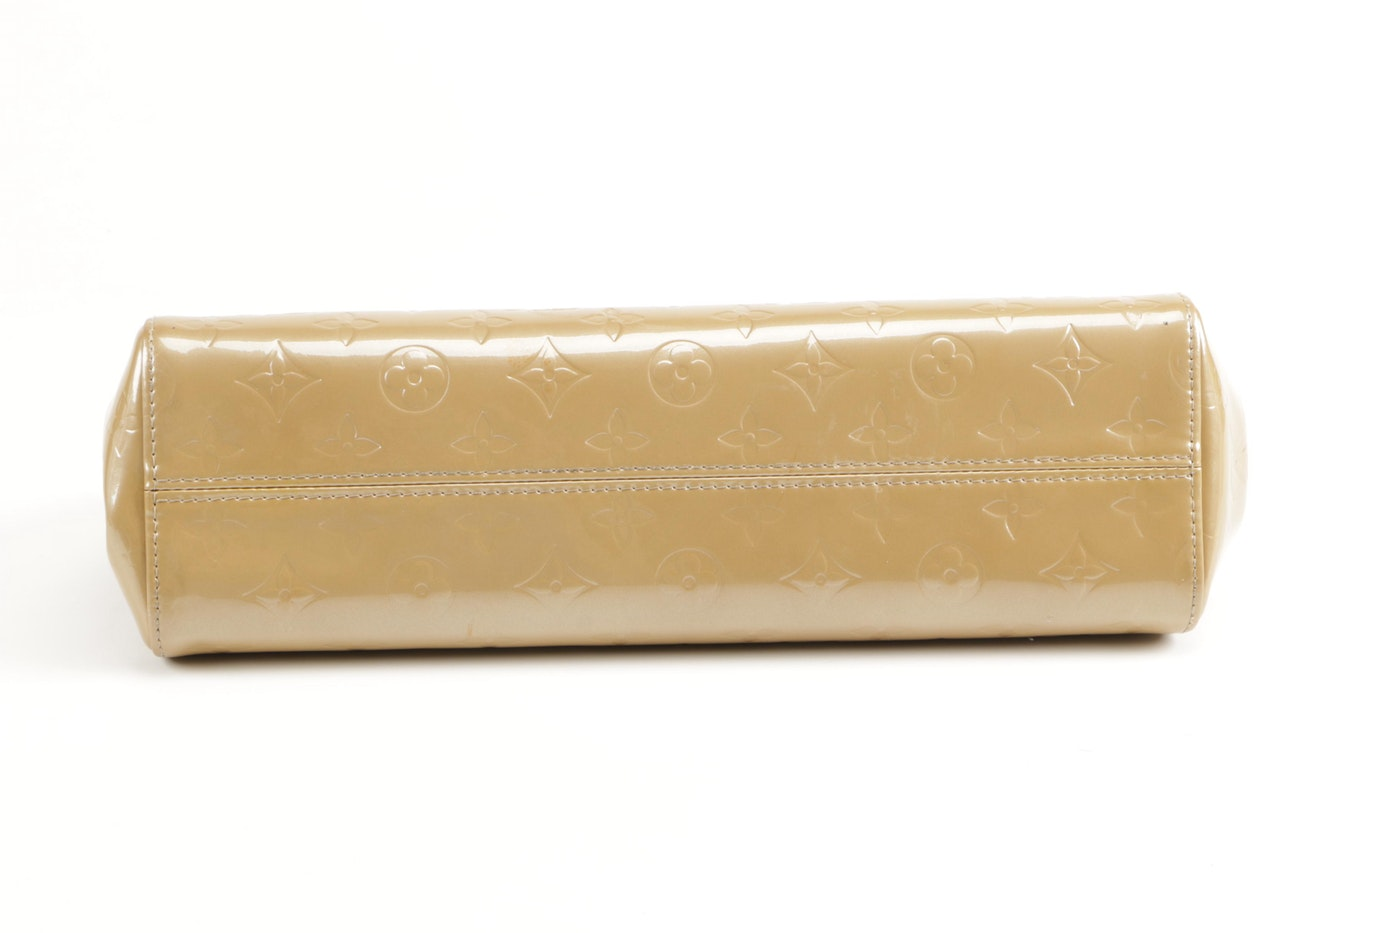 louis vuitton roxbury drive vernis patent leather handbag ebth. Black Bedroom Furniture Sets. Home Design Ideas